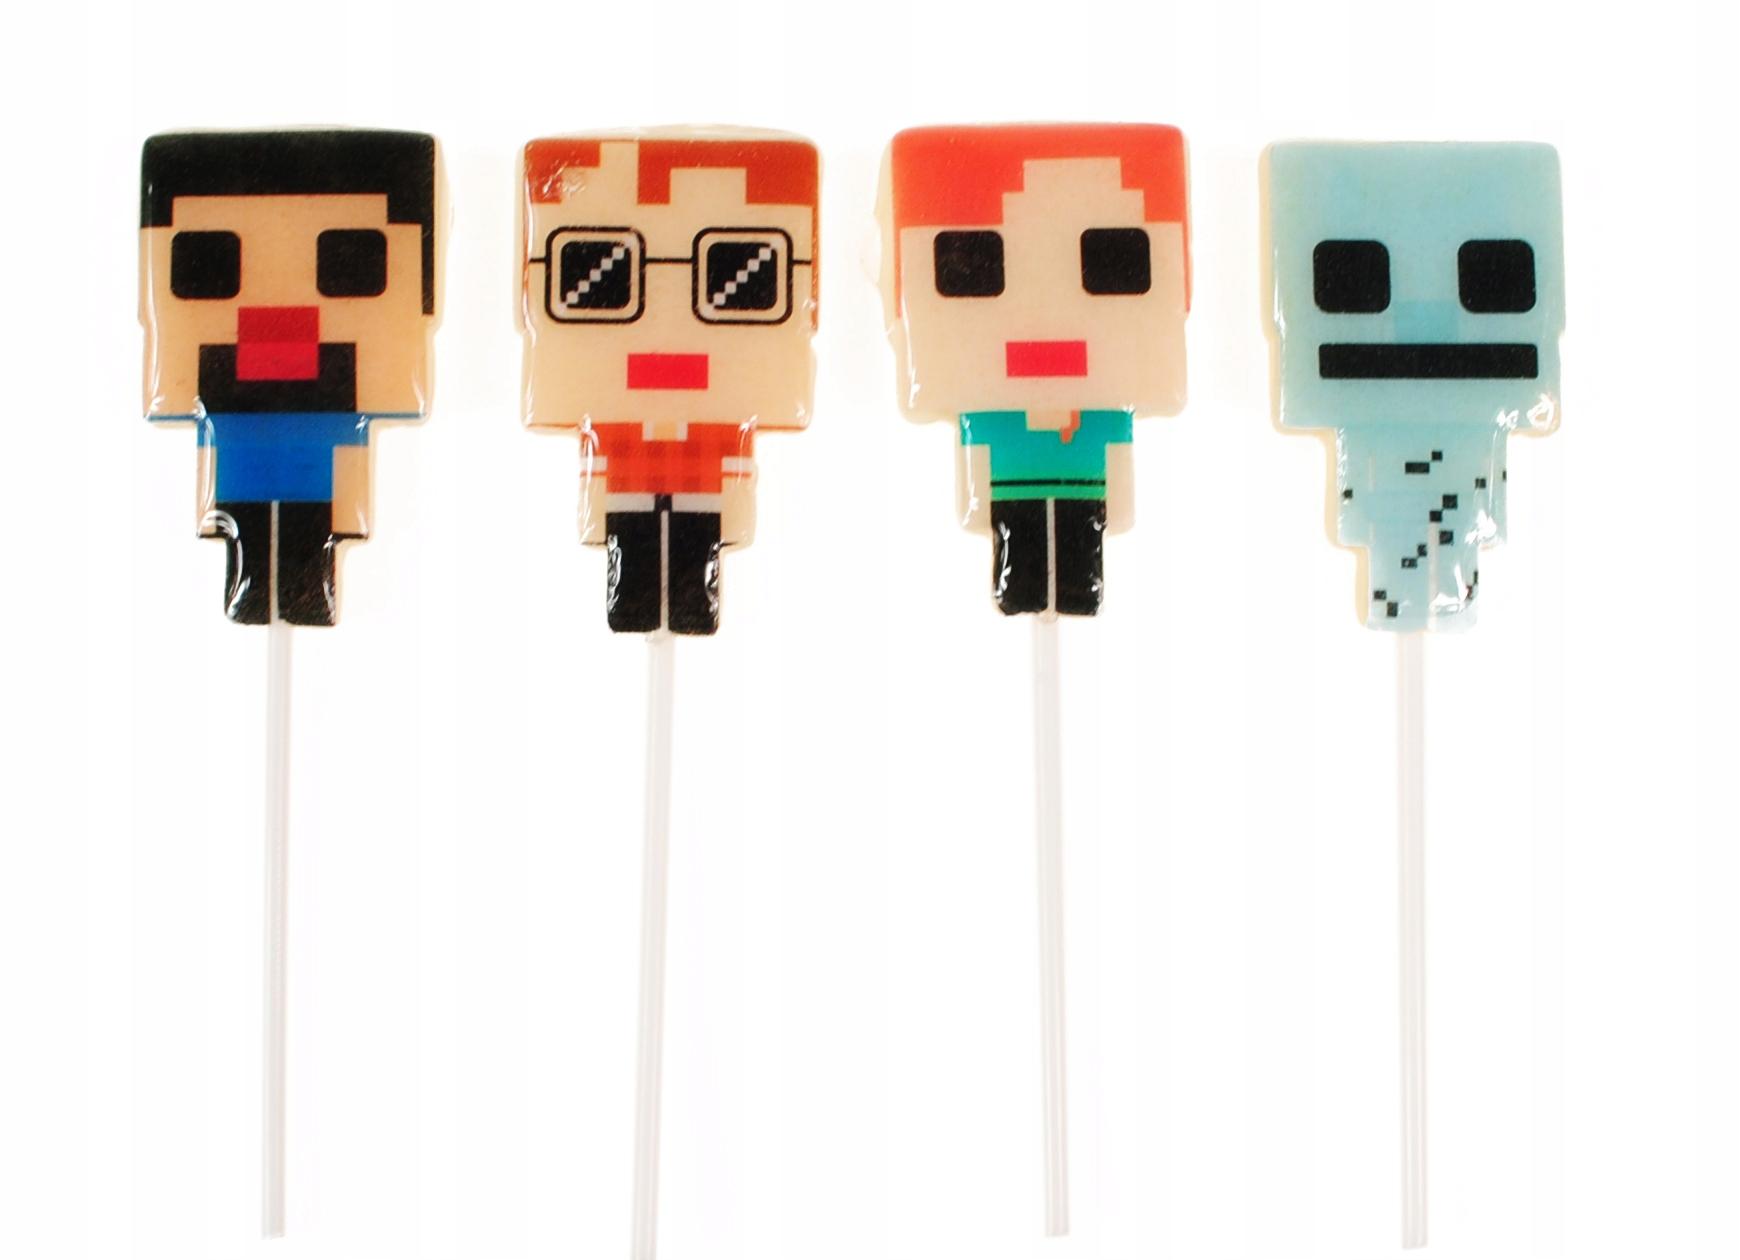 Candy Minecraft, hrdinovia 30g 30pcs